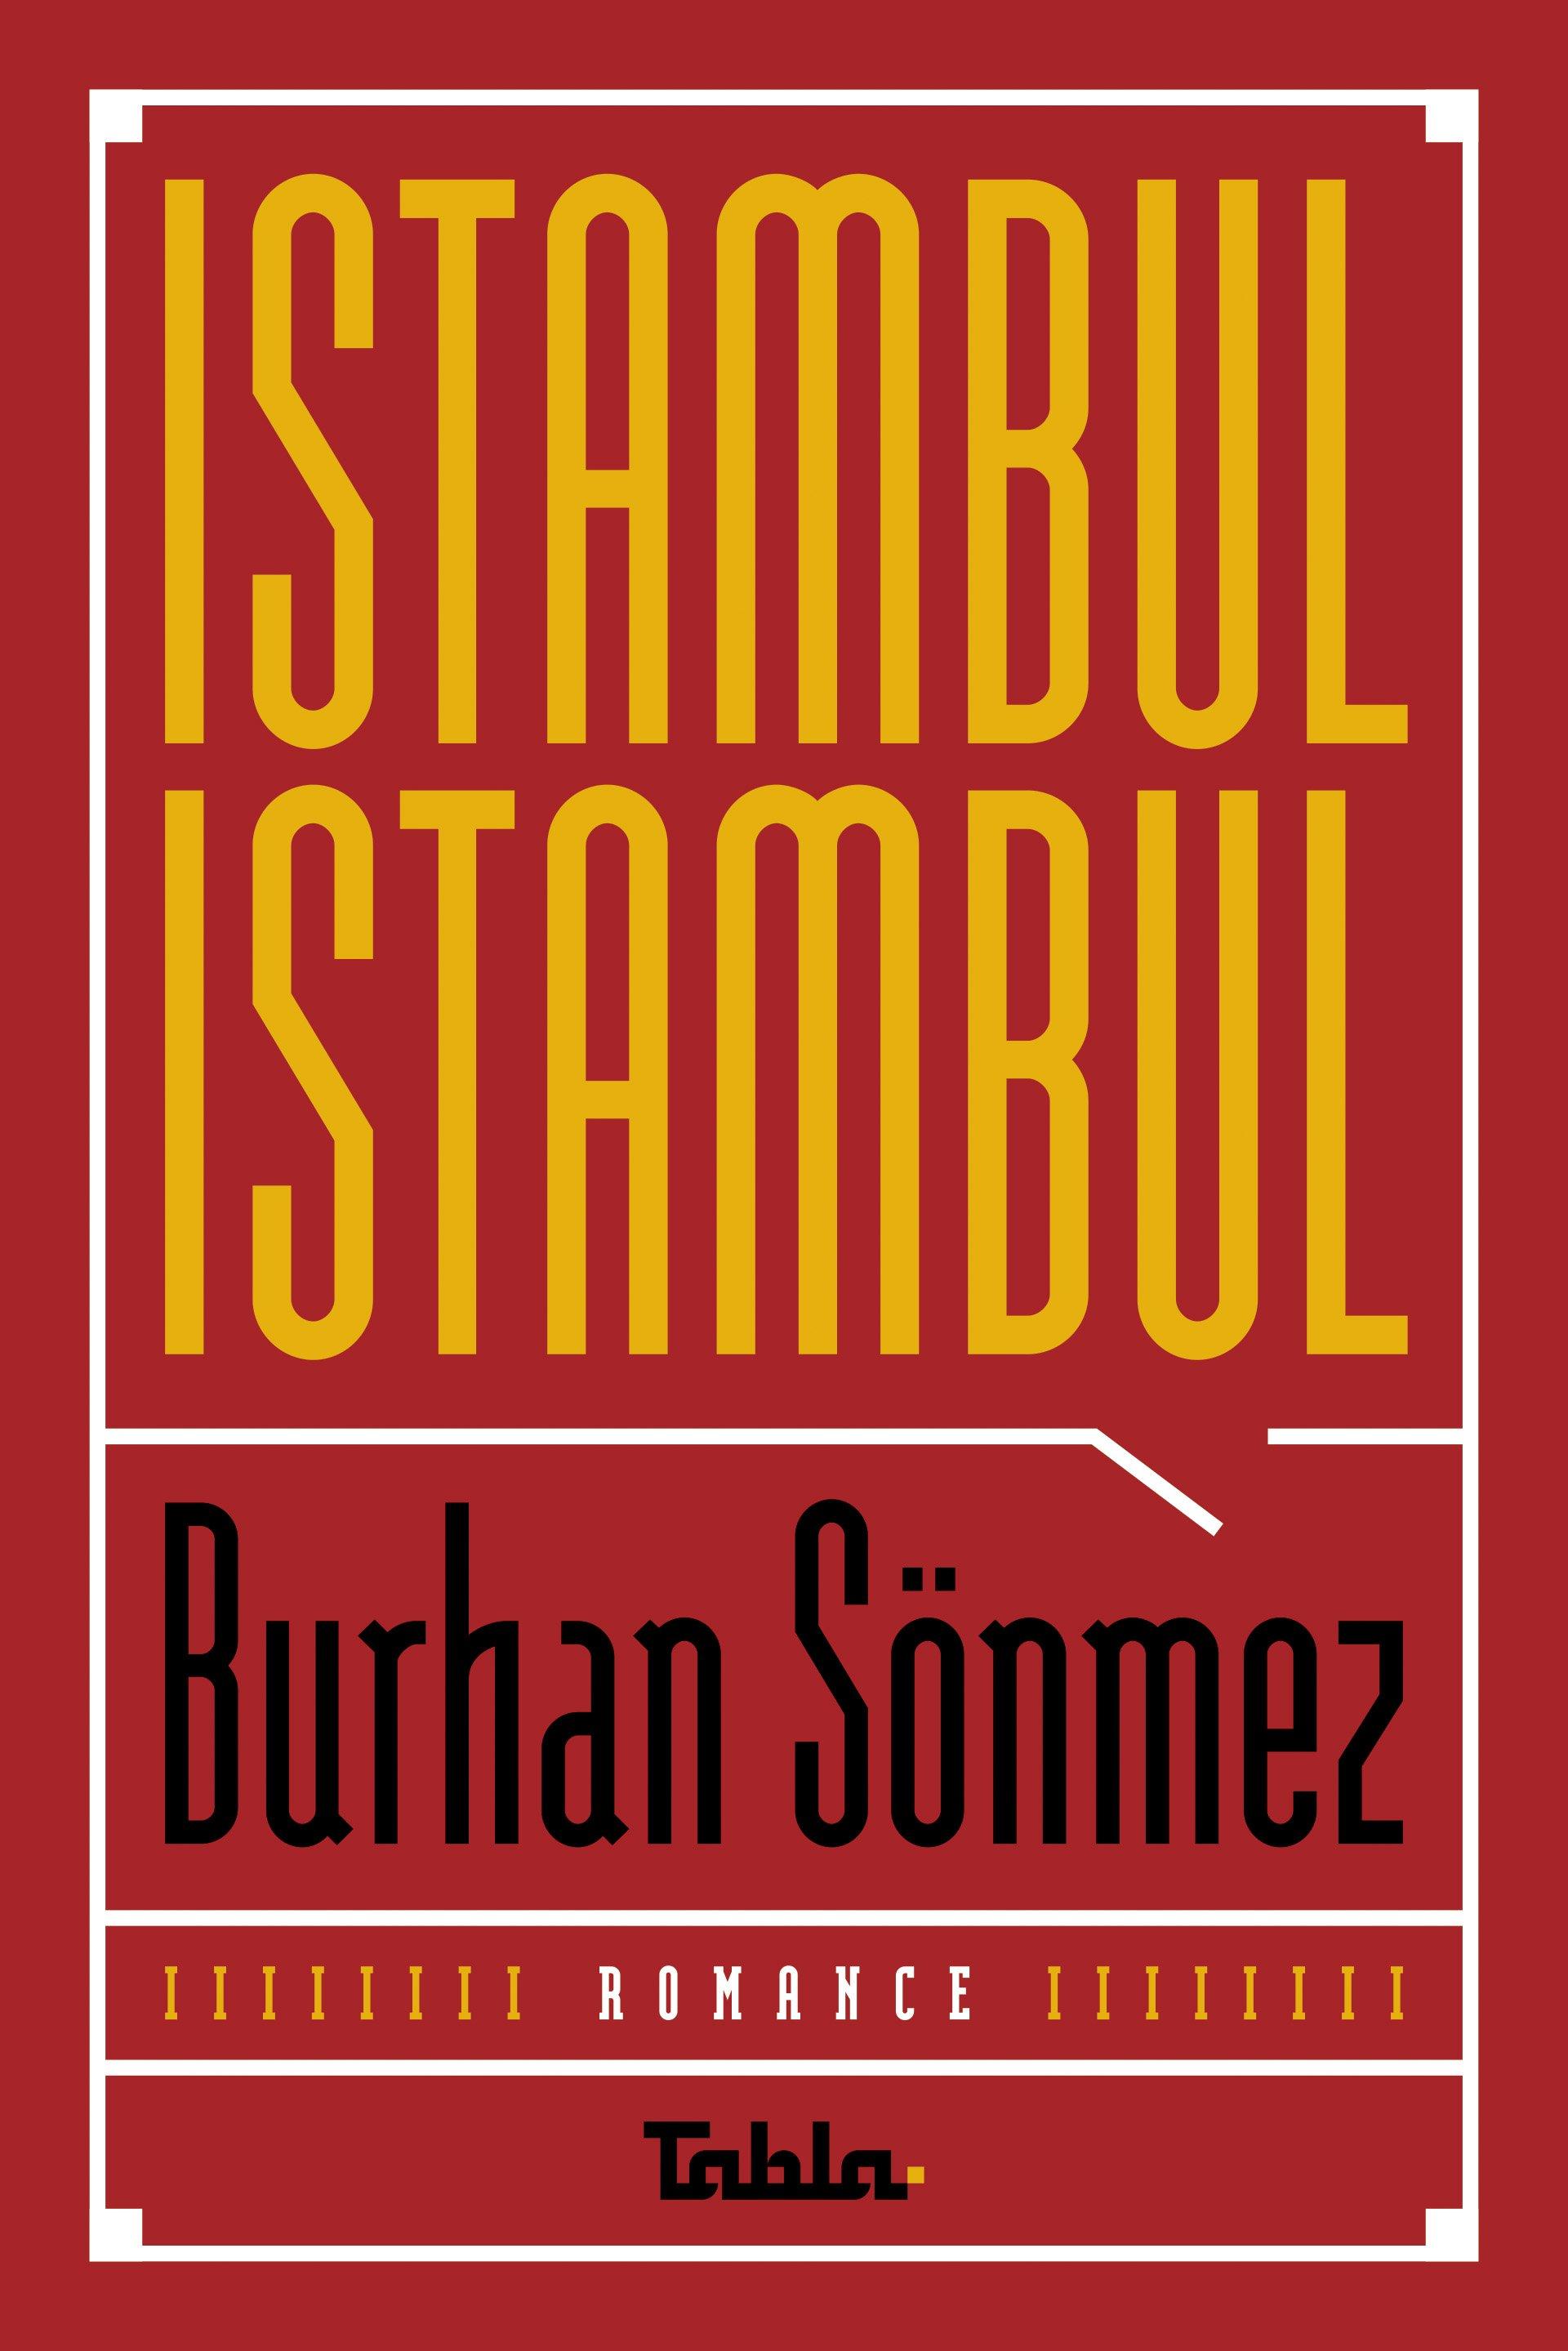 Istambul Istambul, livro de Burhan Sönmez